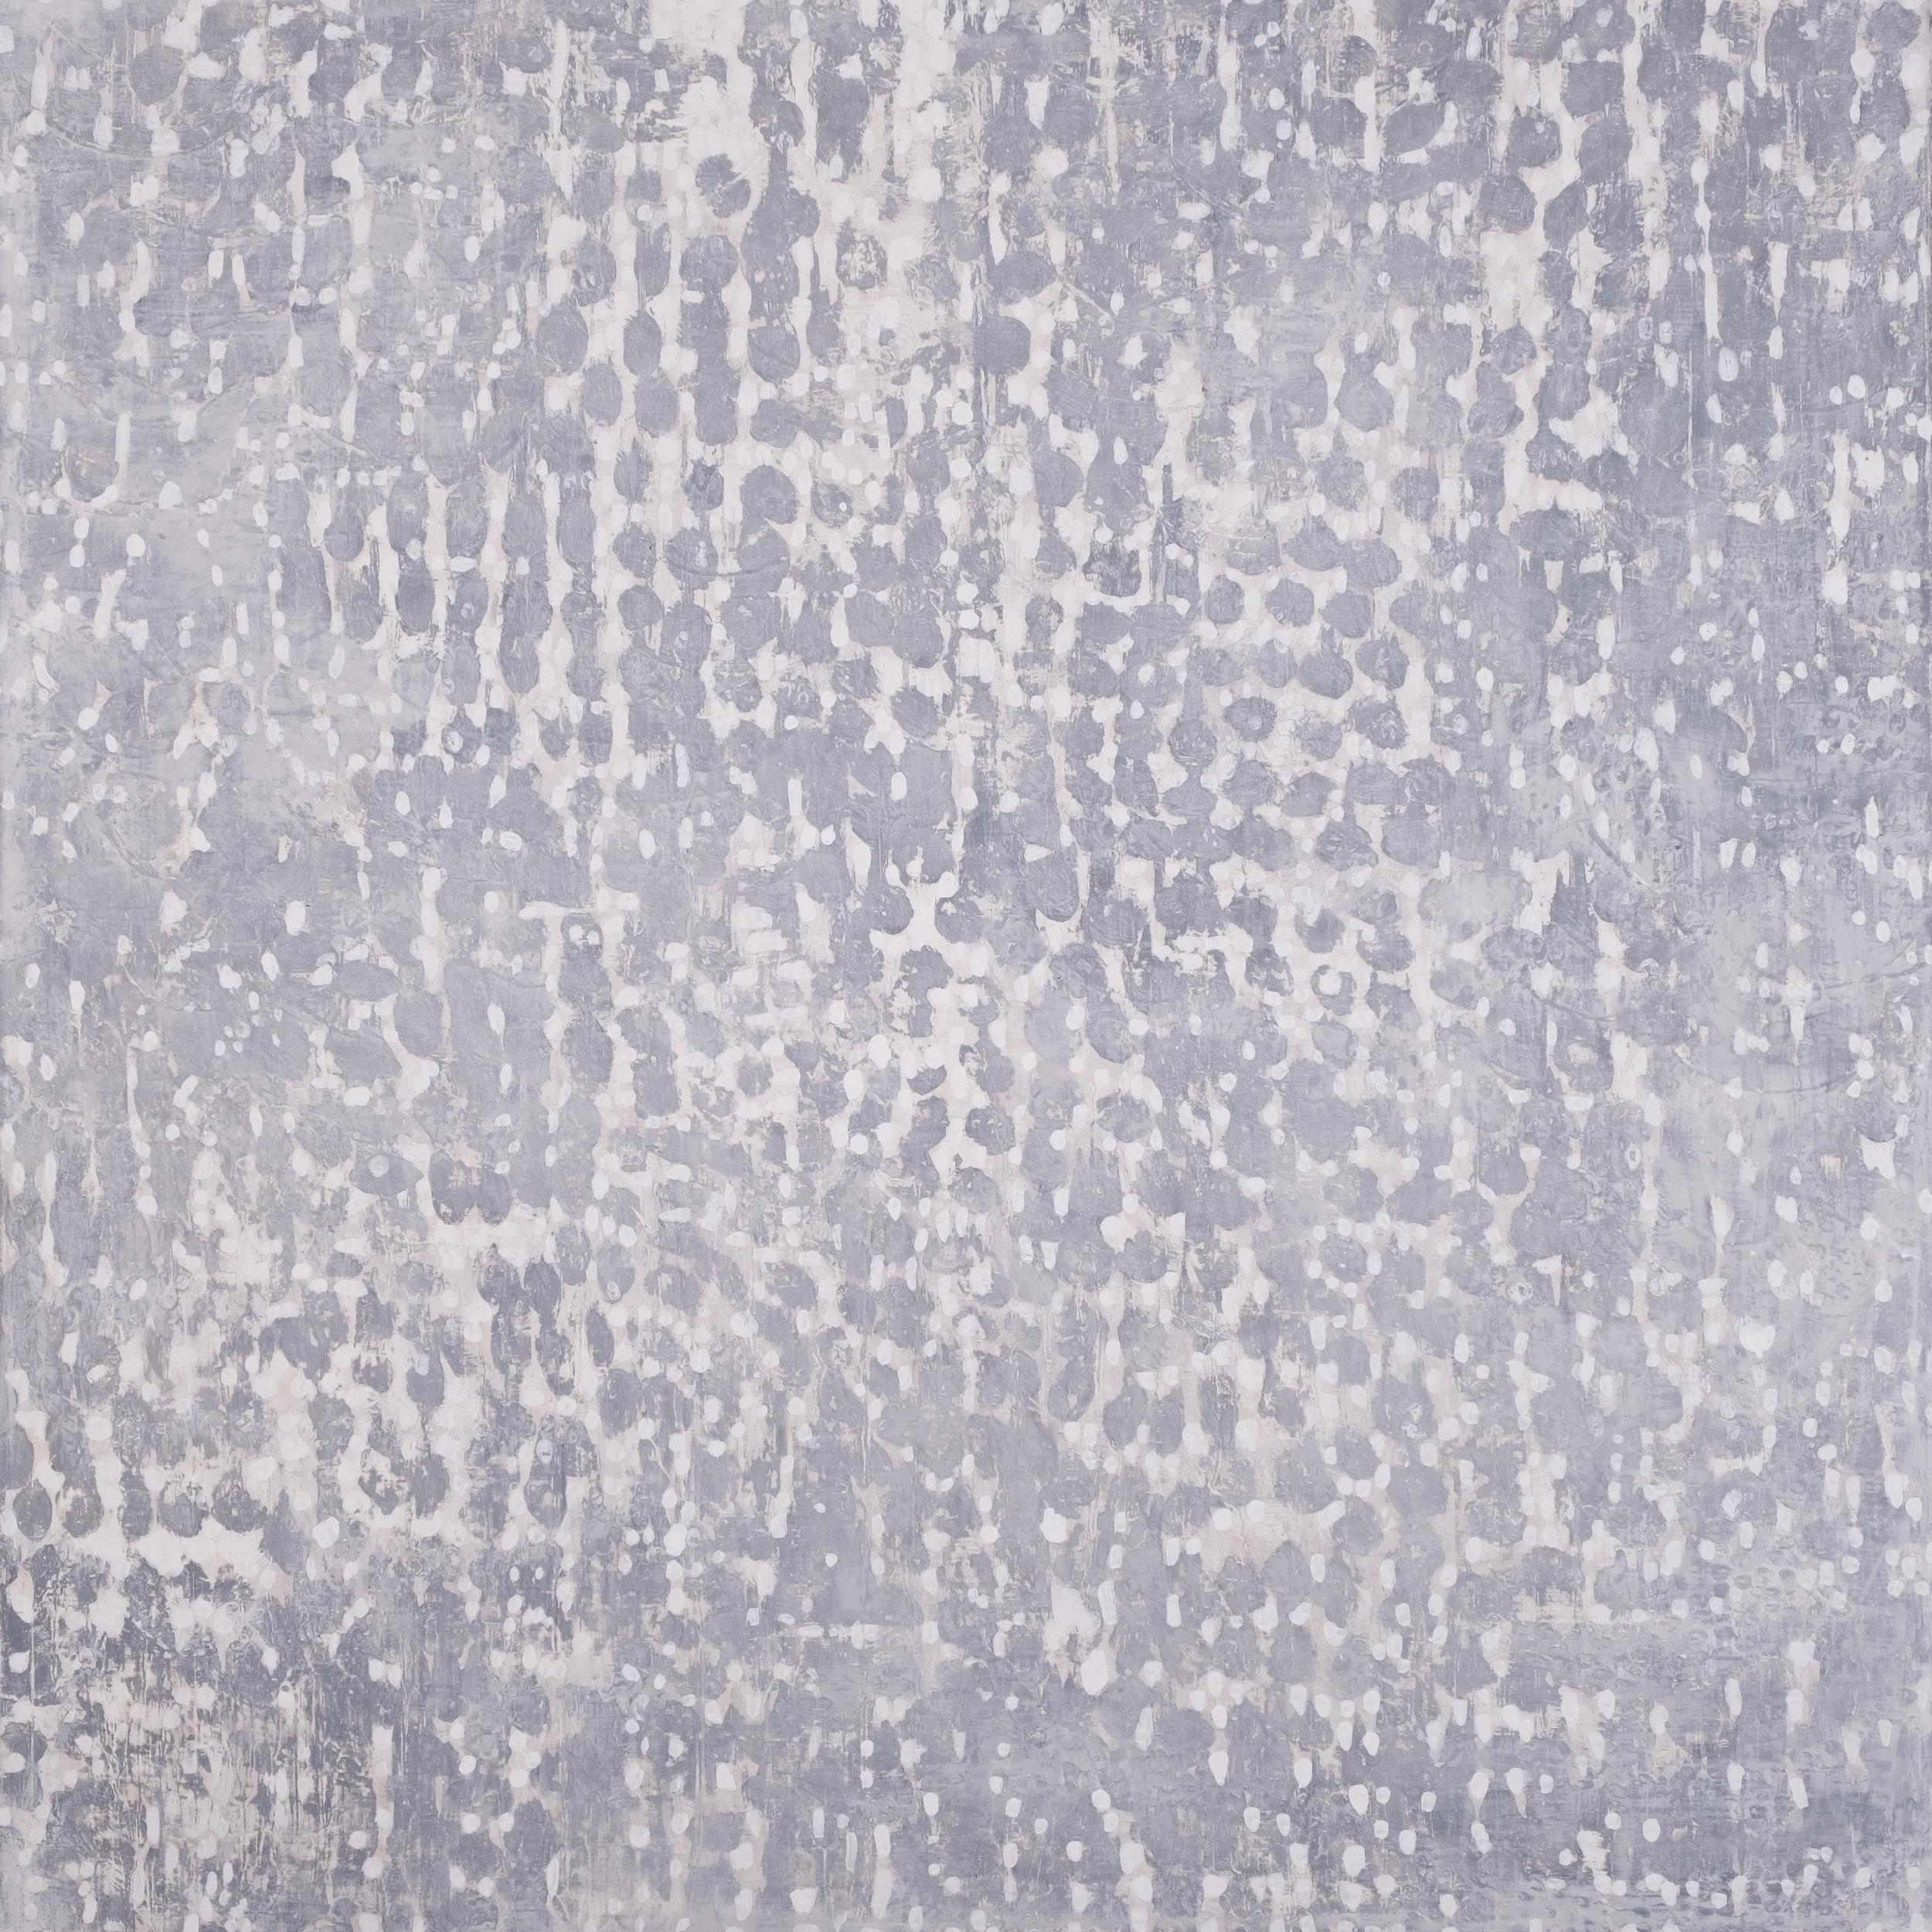 random grey dots.jpg